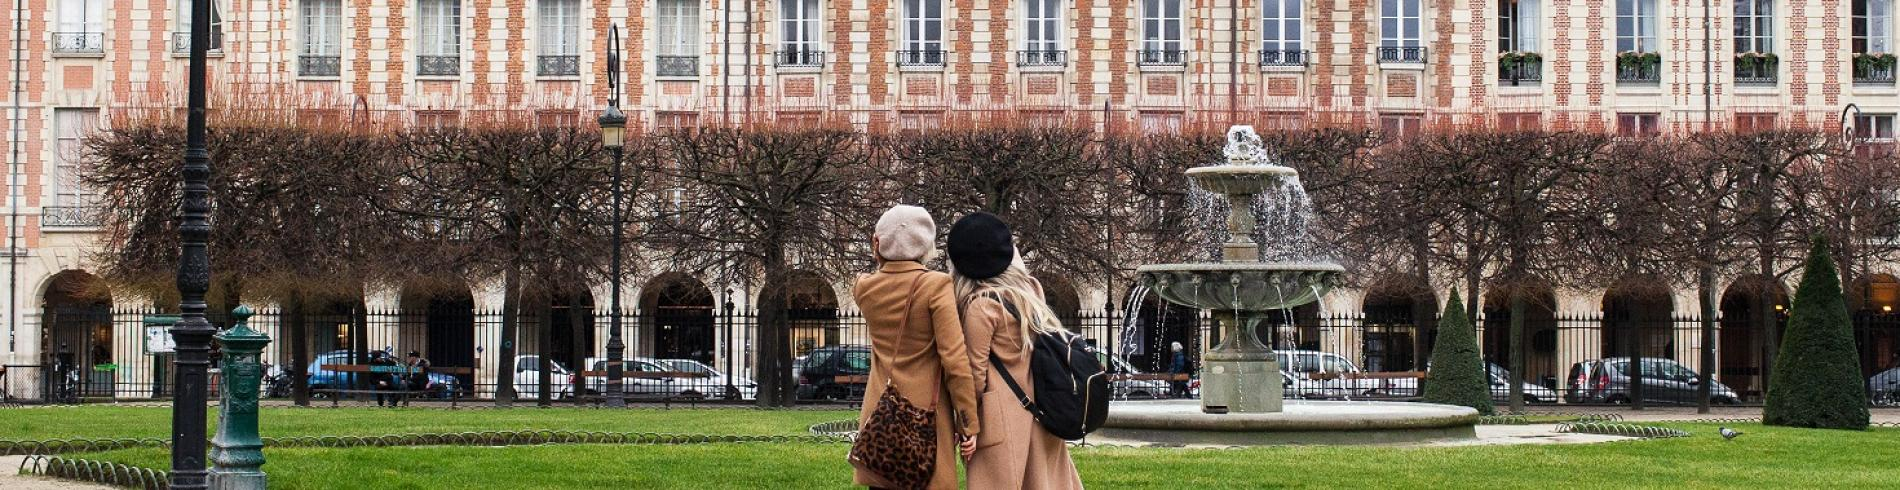 2 friends in Paris in the winter